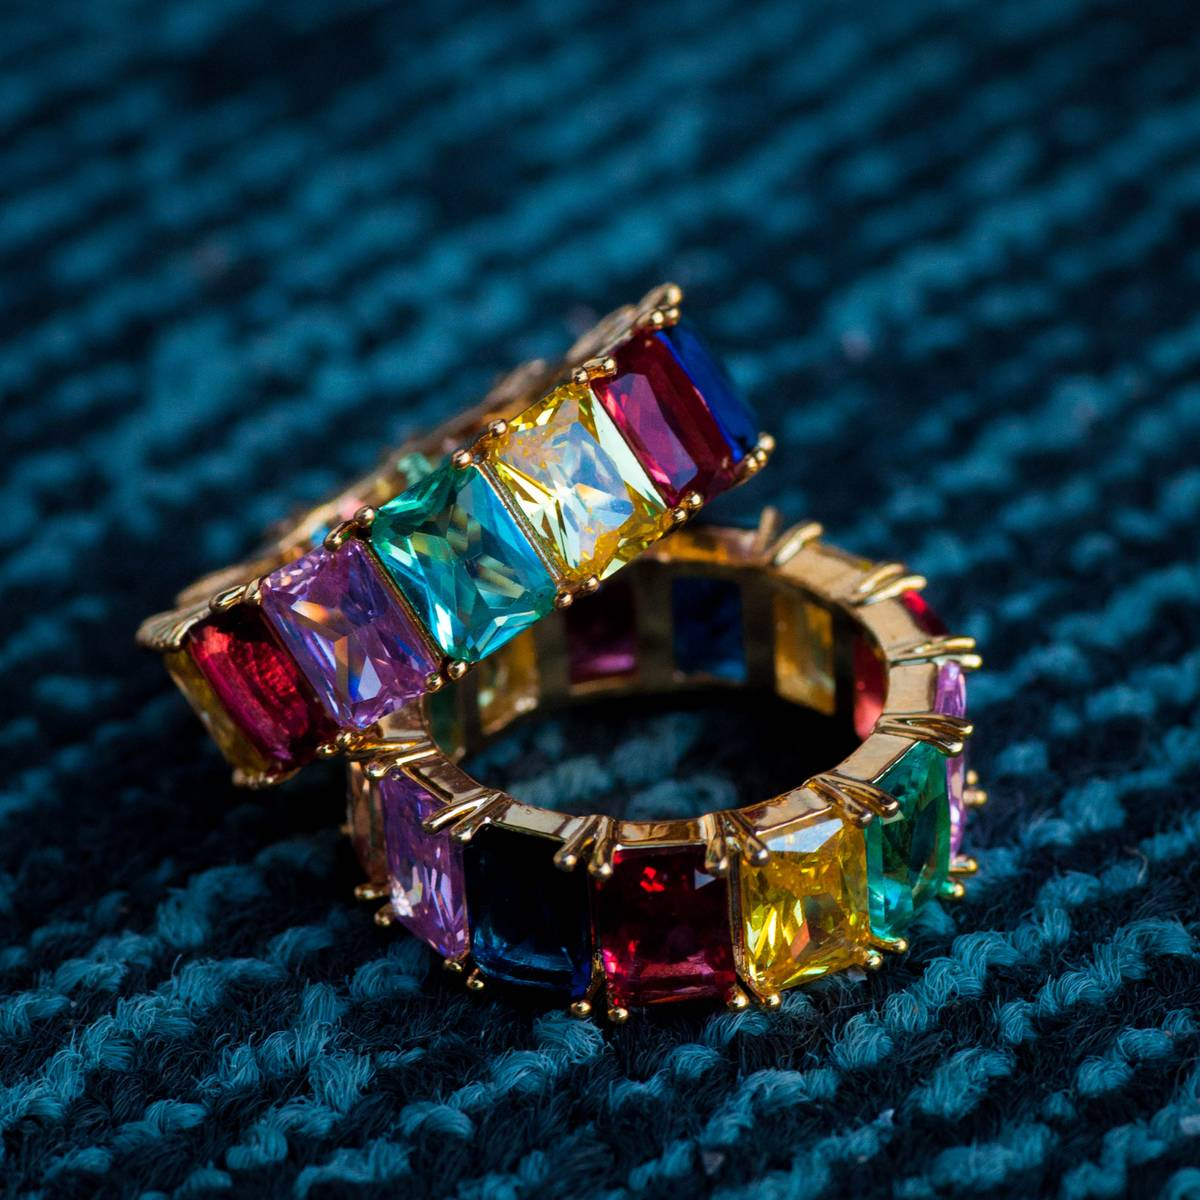 14k Gold Baguette Ring w Multi-Colored Stones Rainbow size 8 9 10 LIFETIME WARRANTY